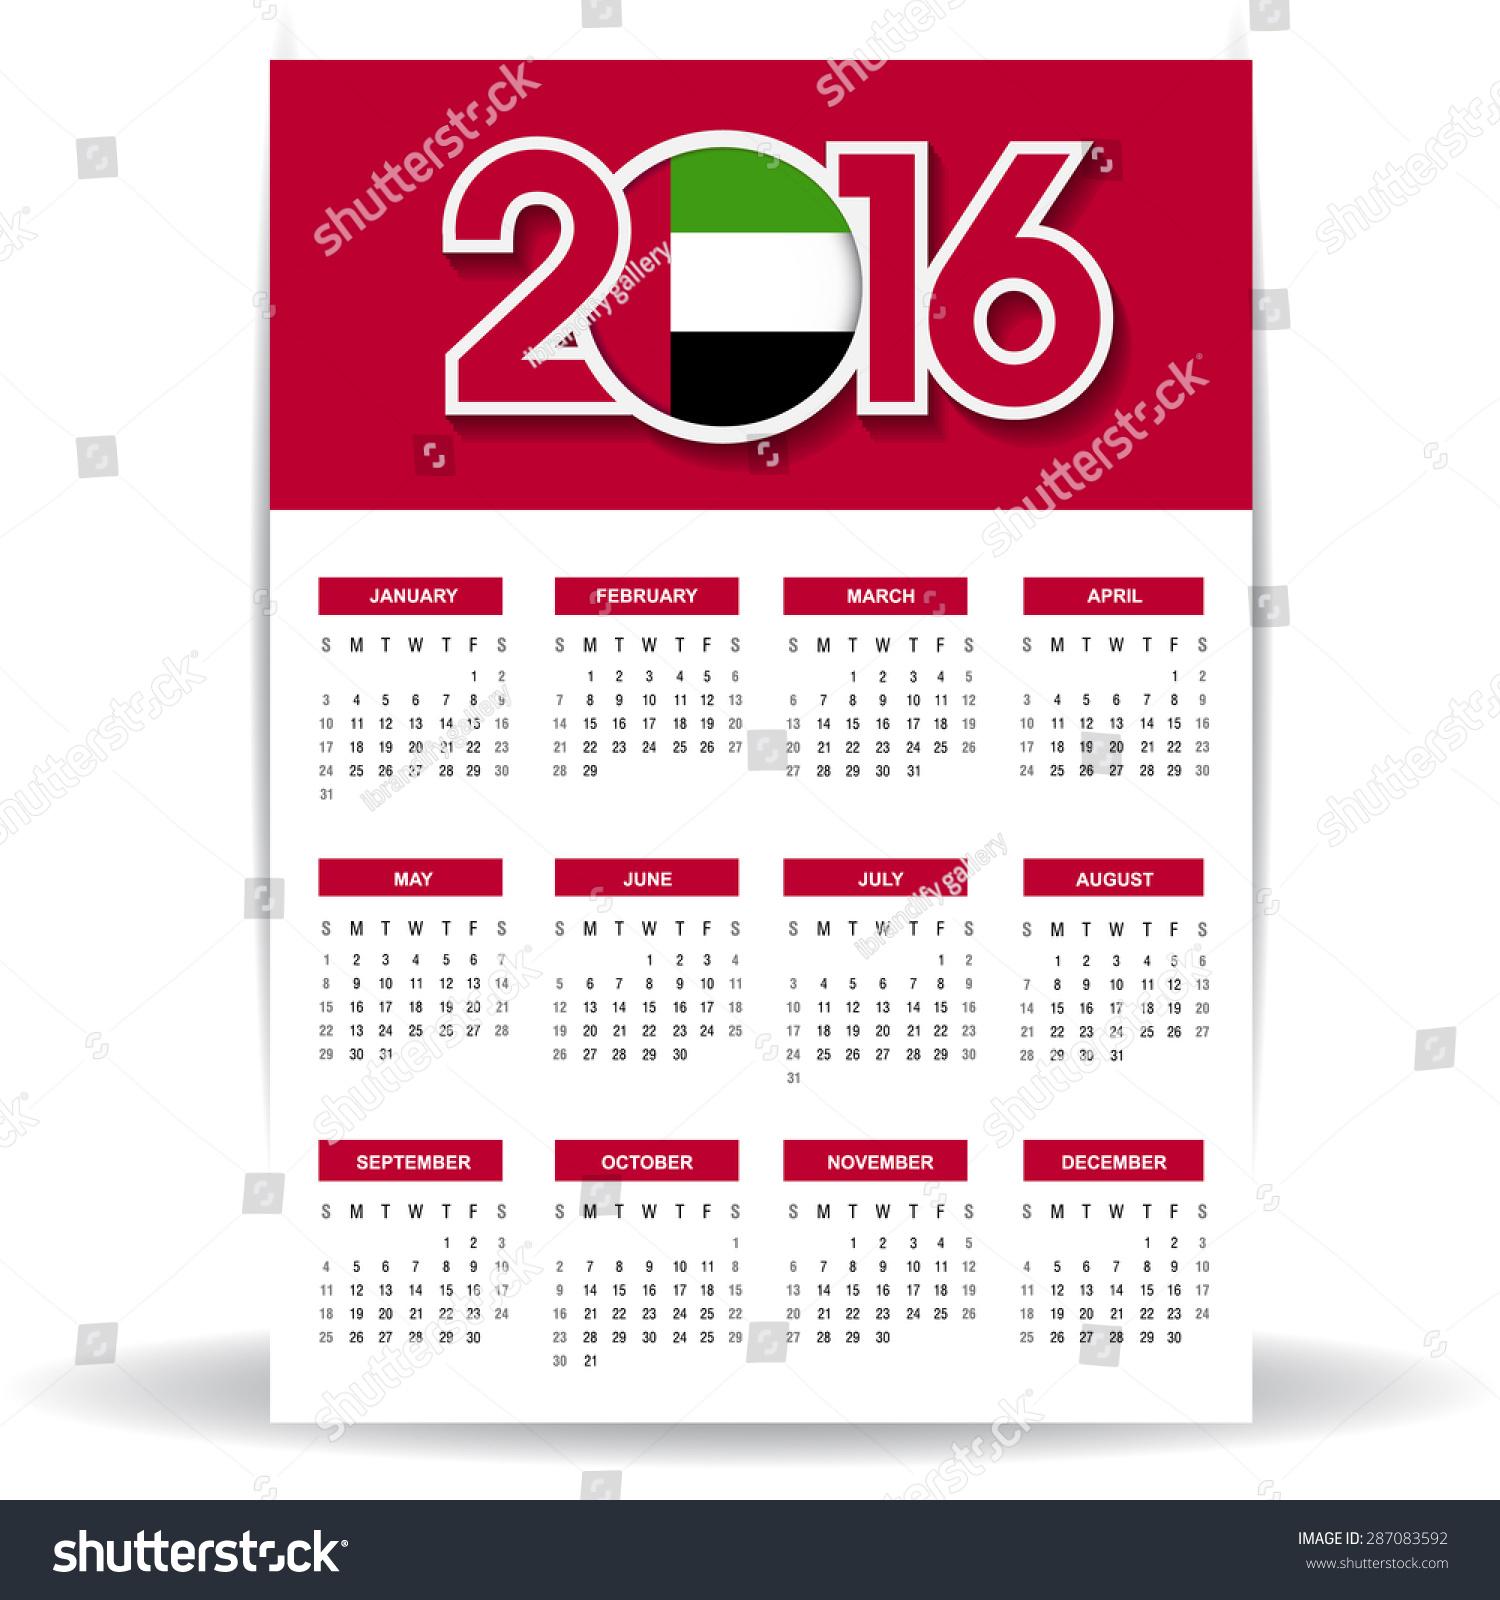 Weekly Calendar Uae : Calendar united arab emirates uae stock vector